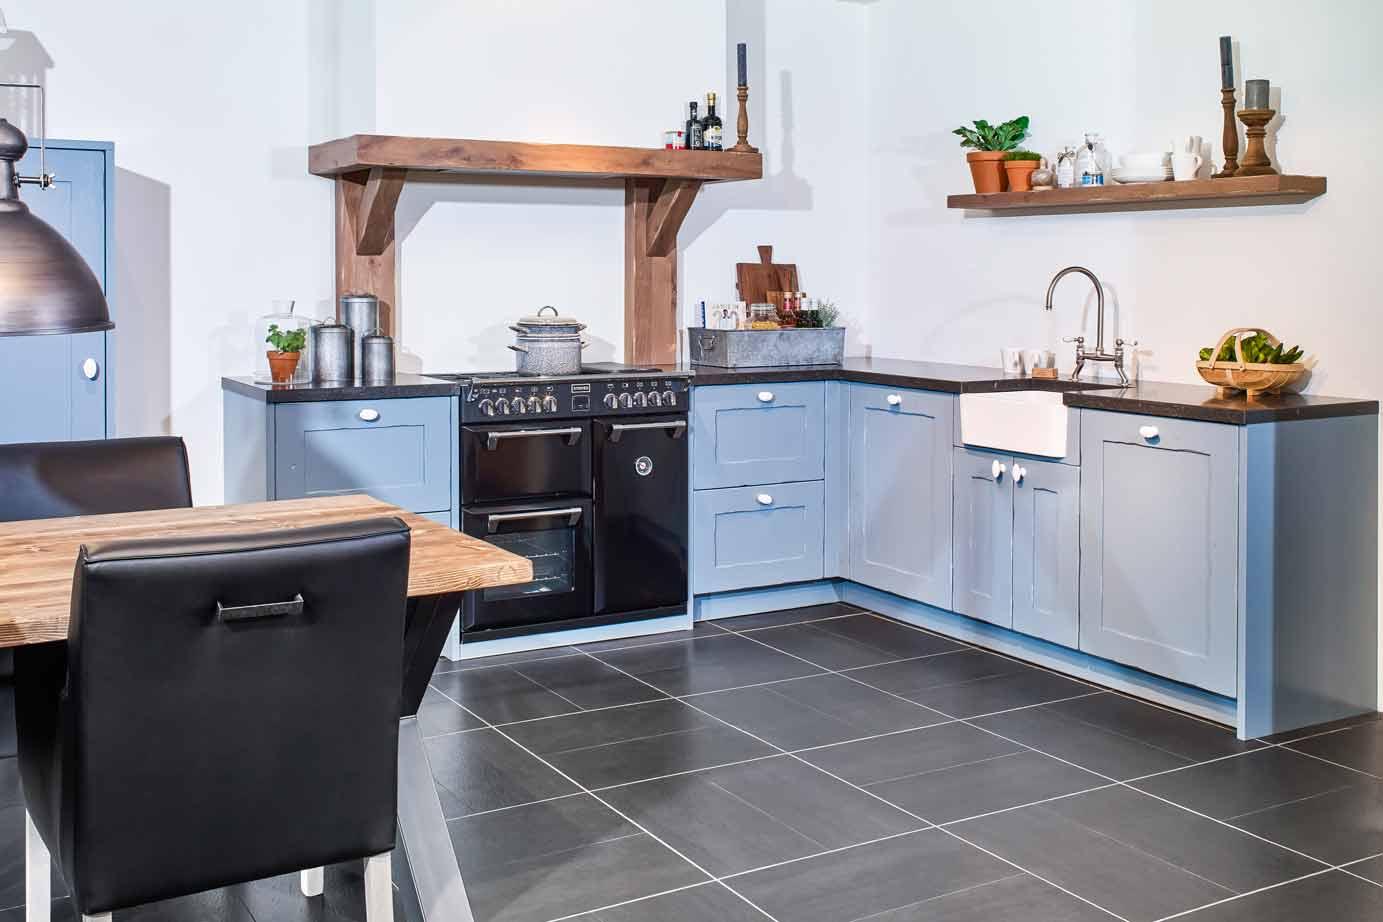 Welke kleur keuken inspirational witte keuken welke kleur muren